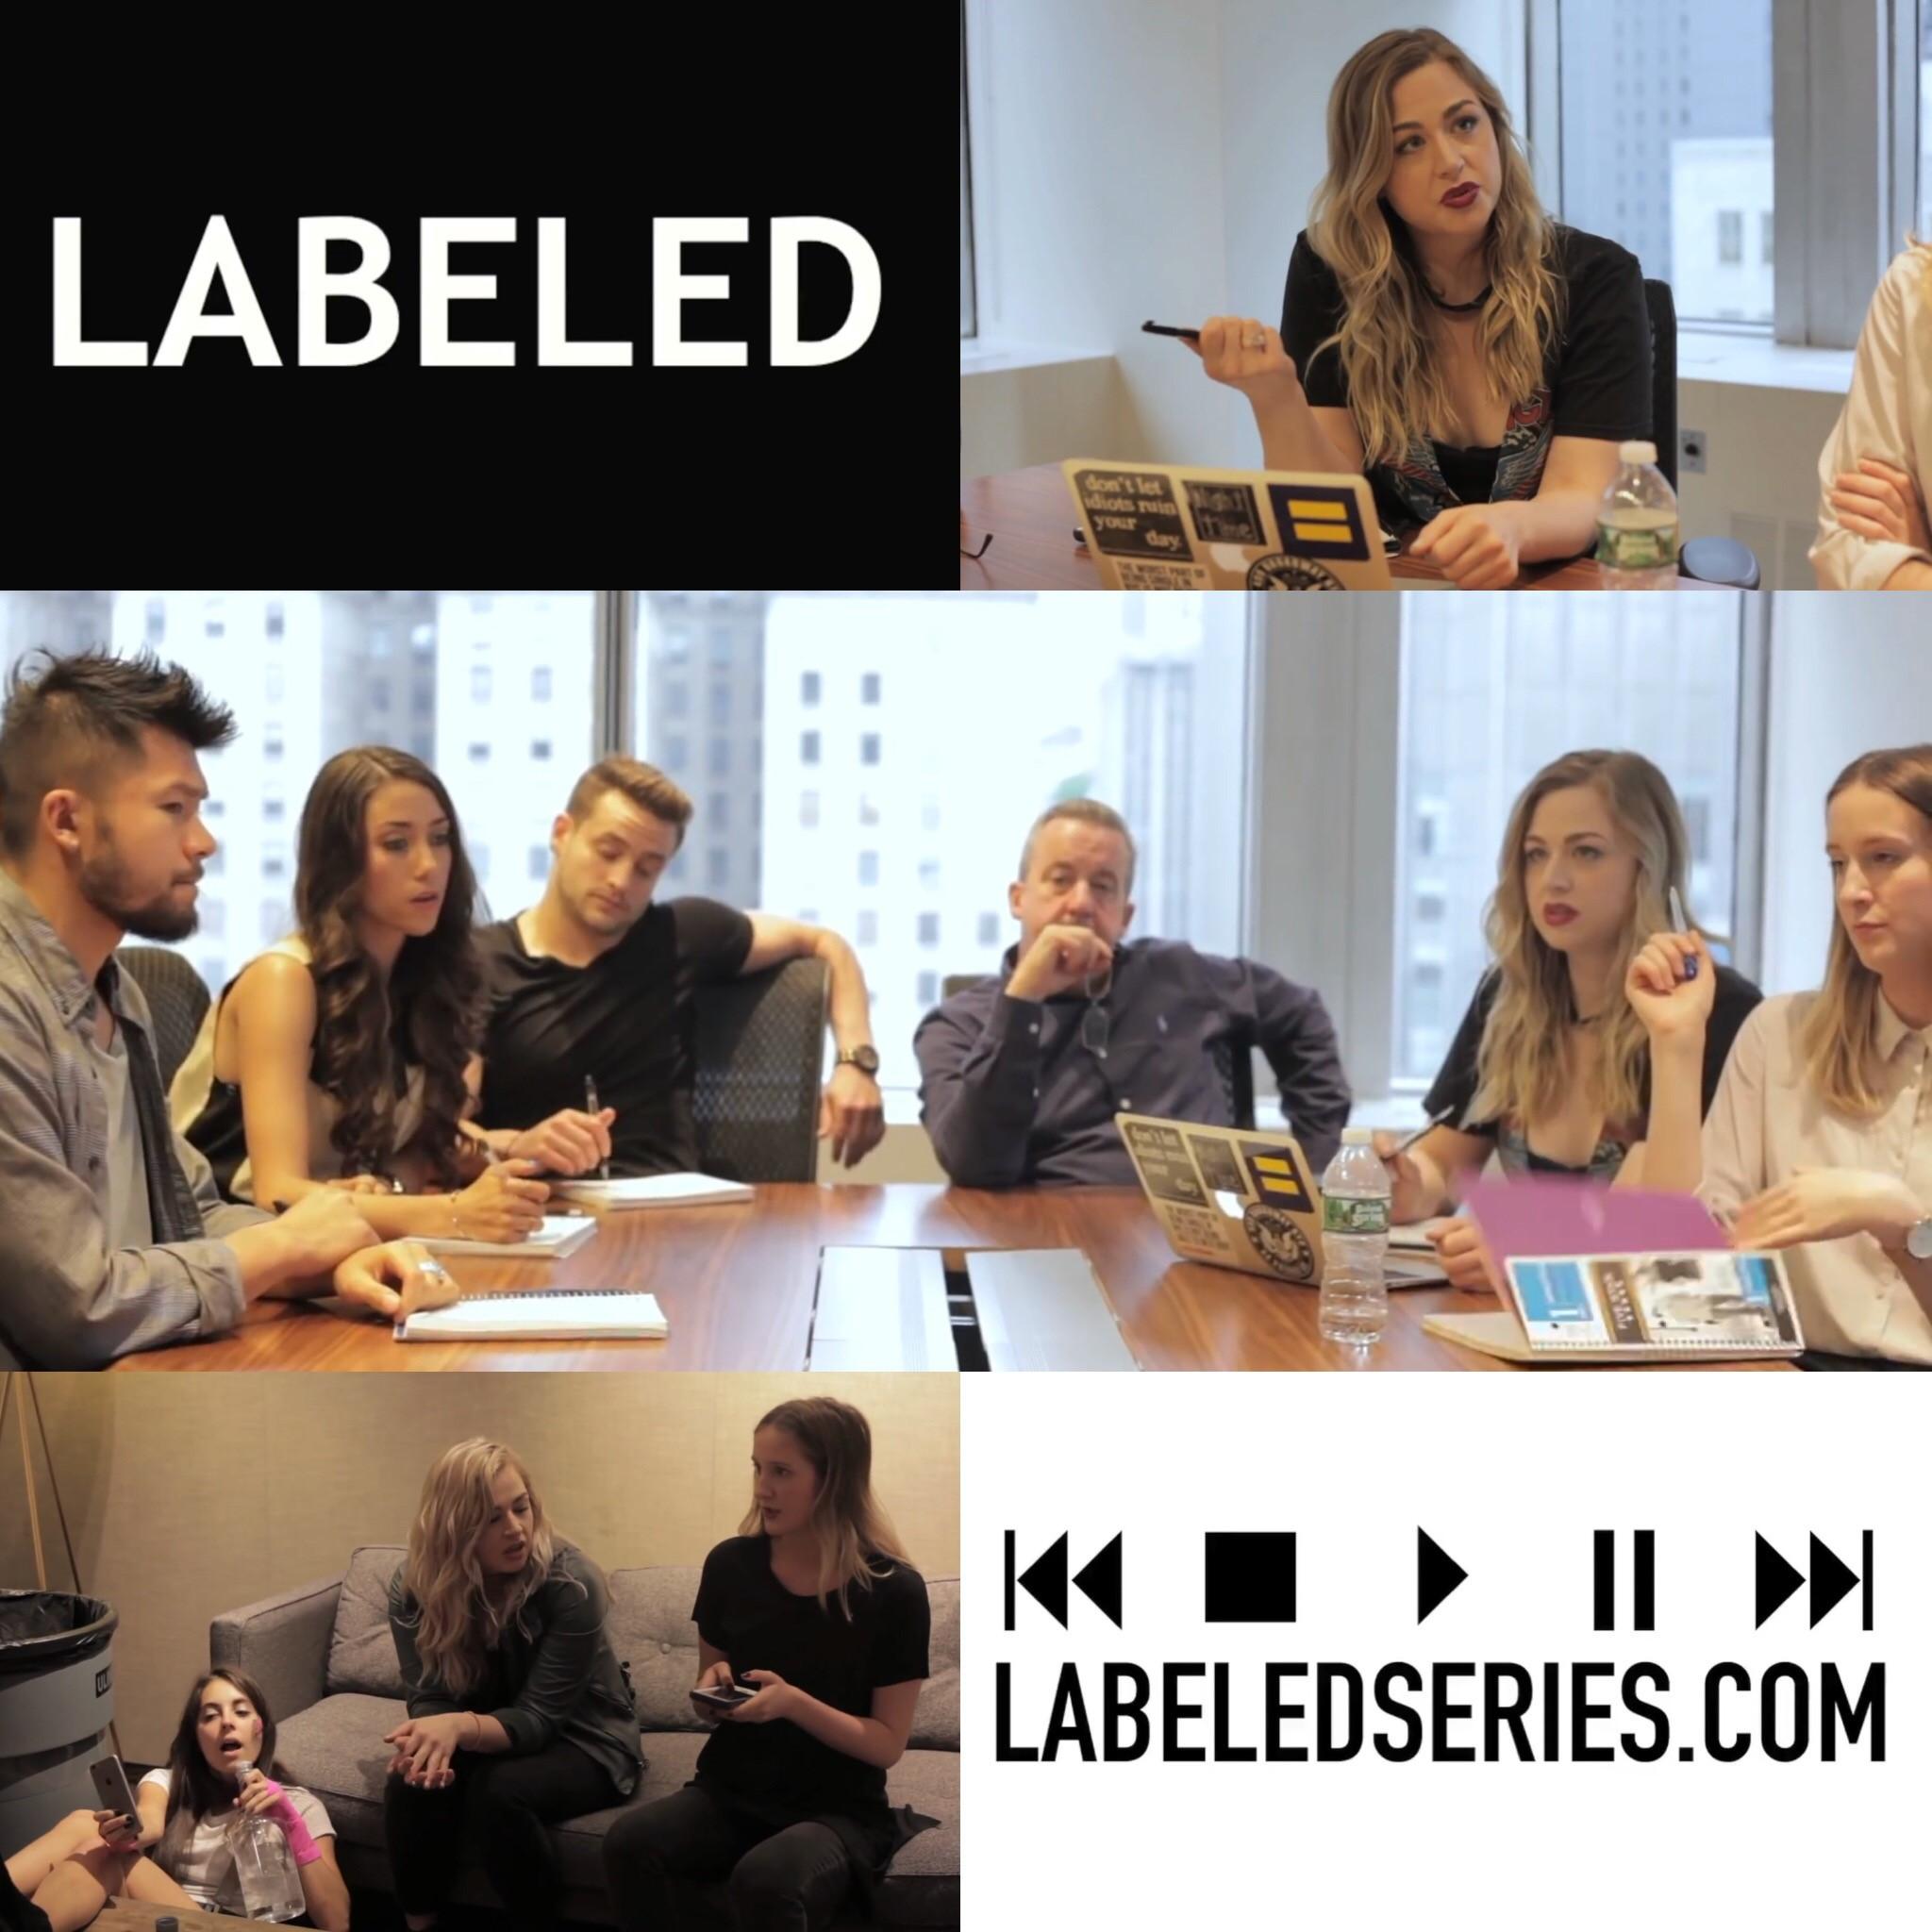 LABELED_Promo.jpg